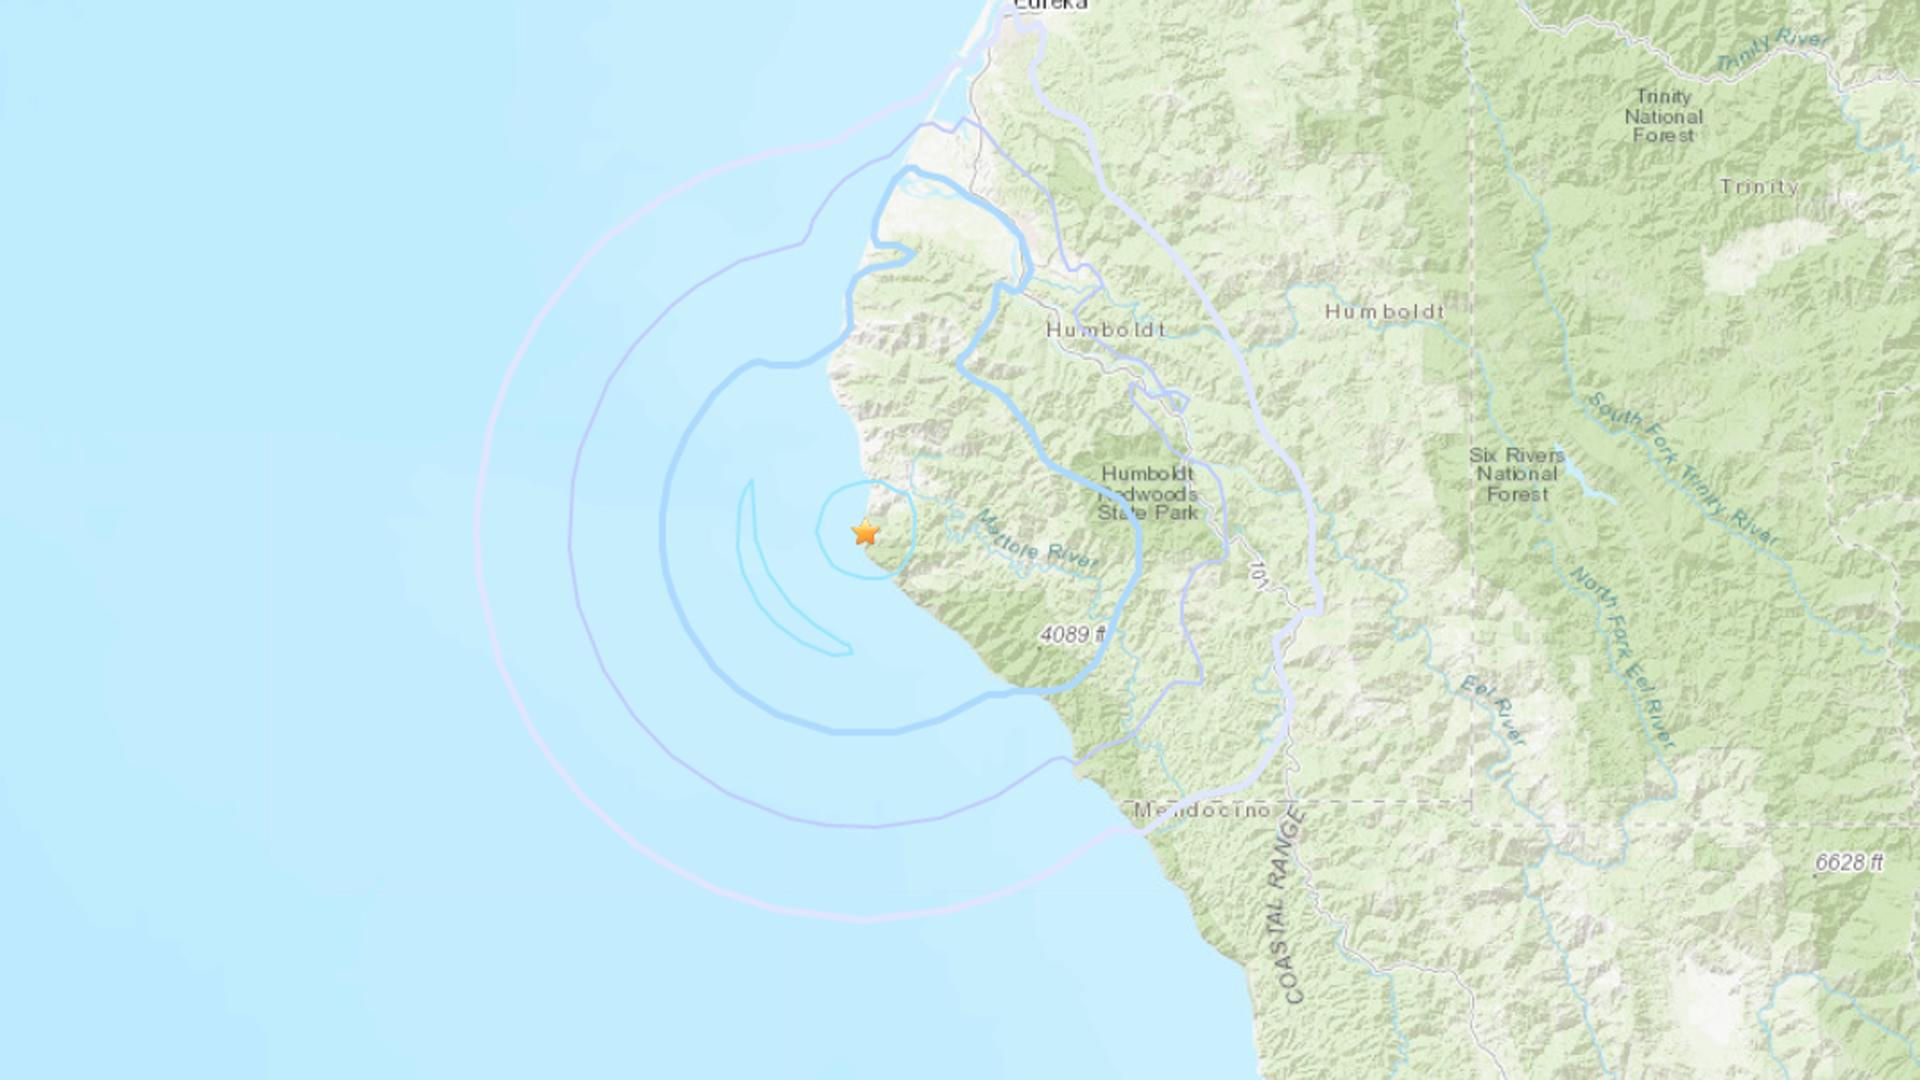 An earthquake struck coastal Northern California on Dec. 19, 2019. (Credit: U.S. Geological Survey)